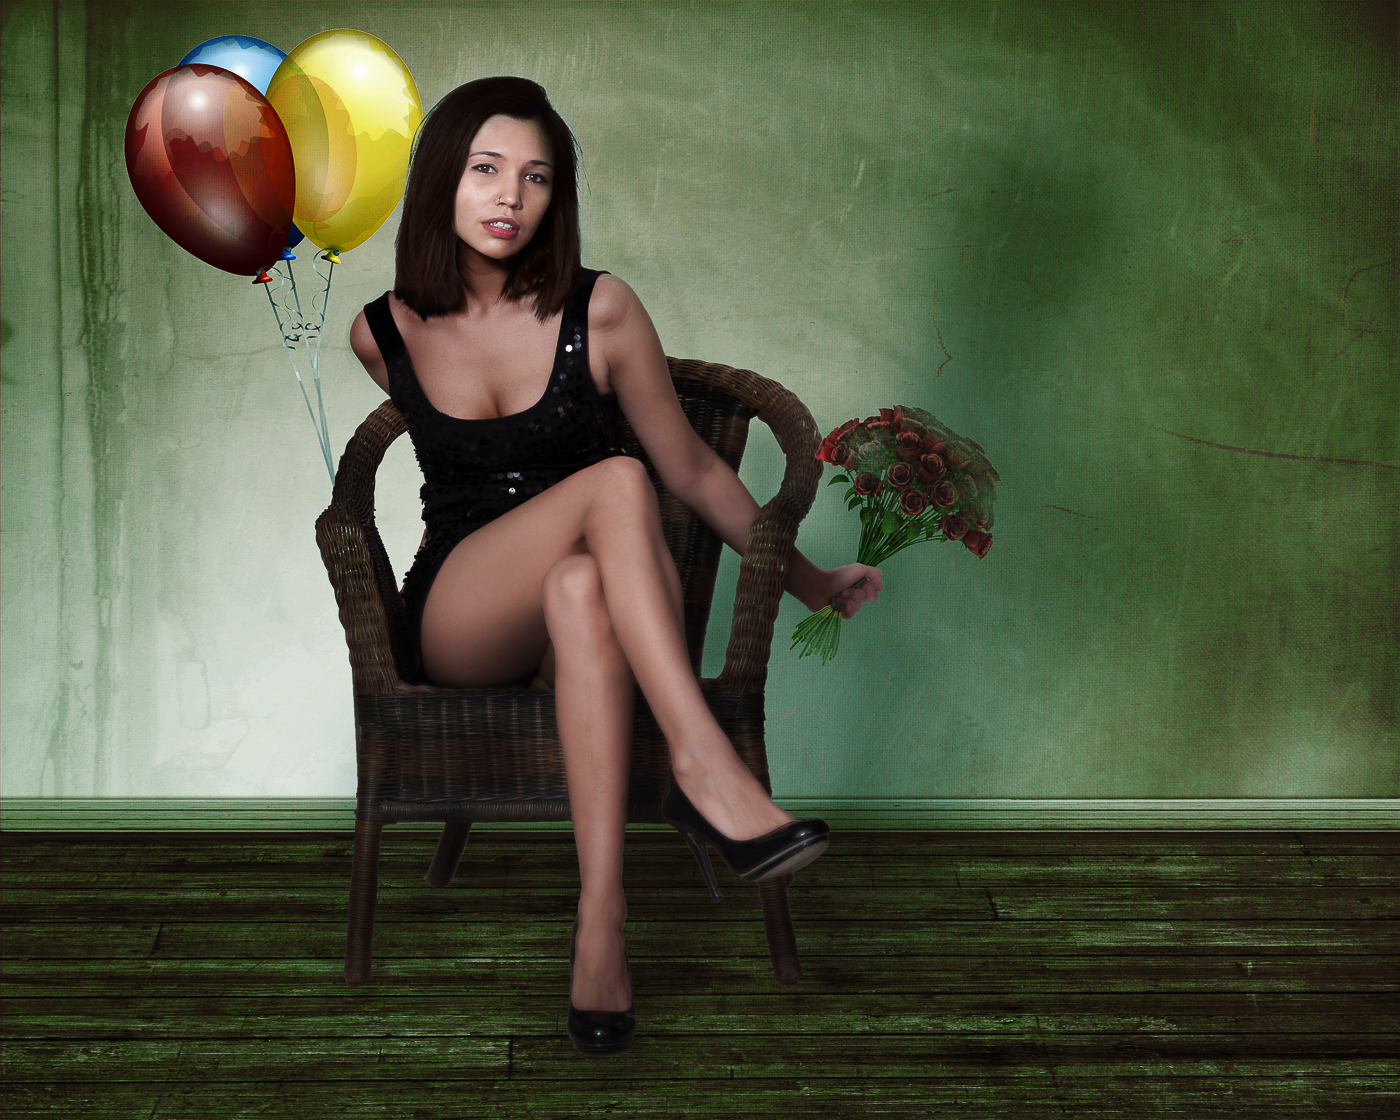 2012-02-09 Ashley Chuitt-254-Edit.jpg